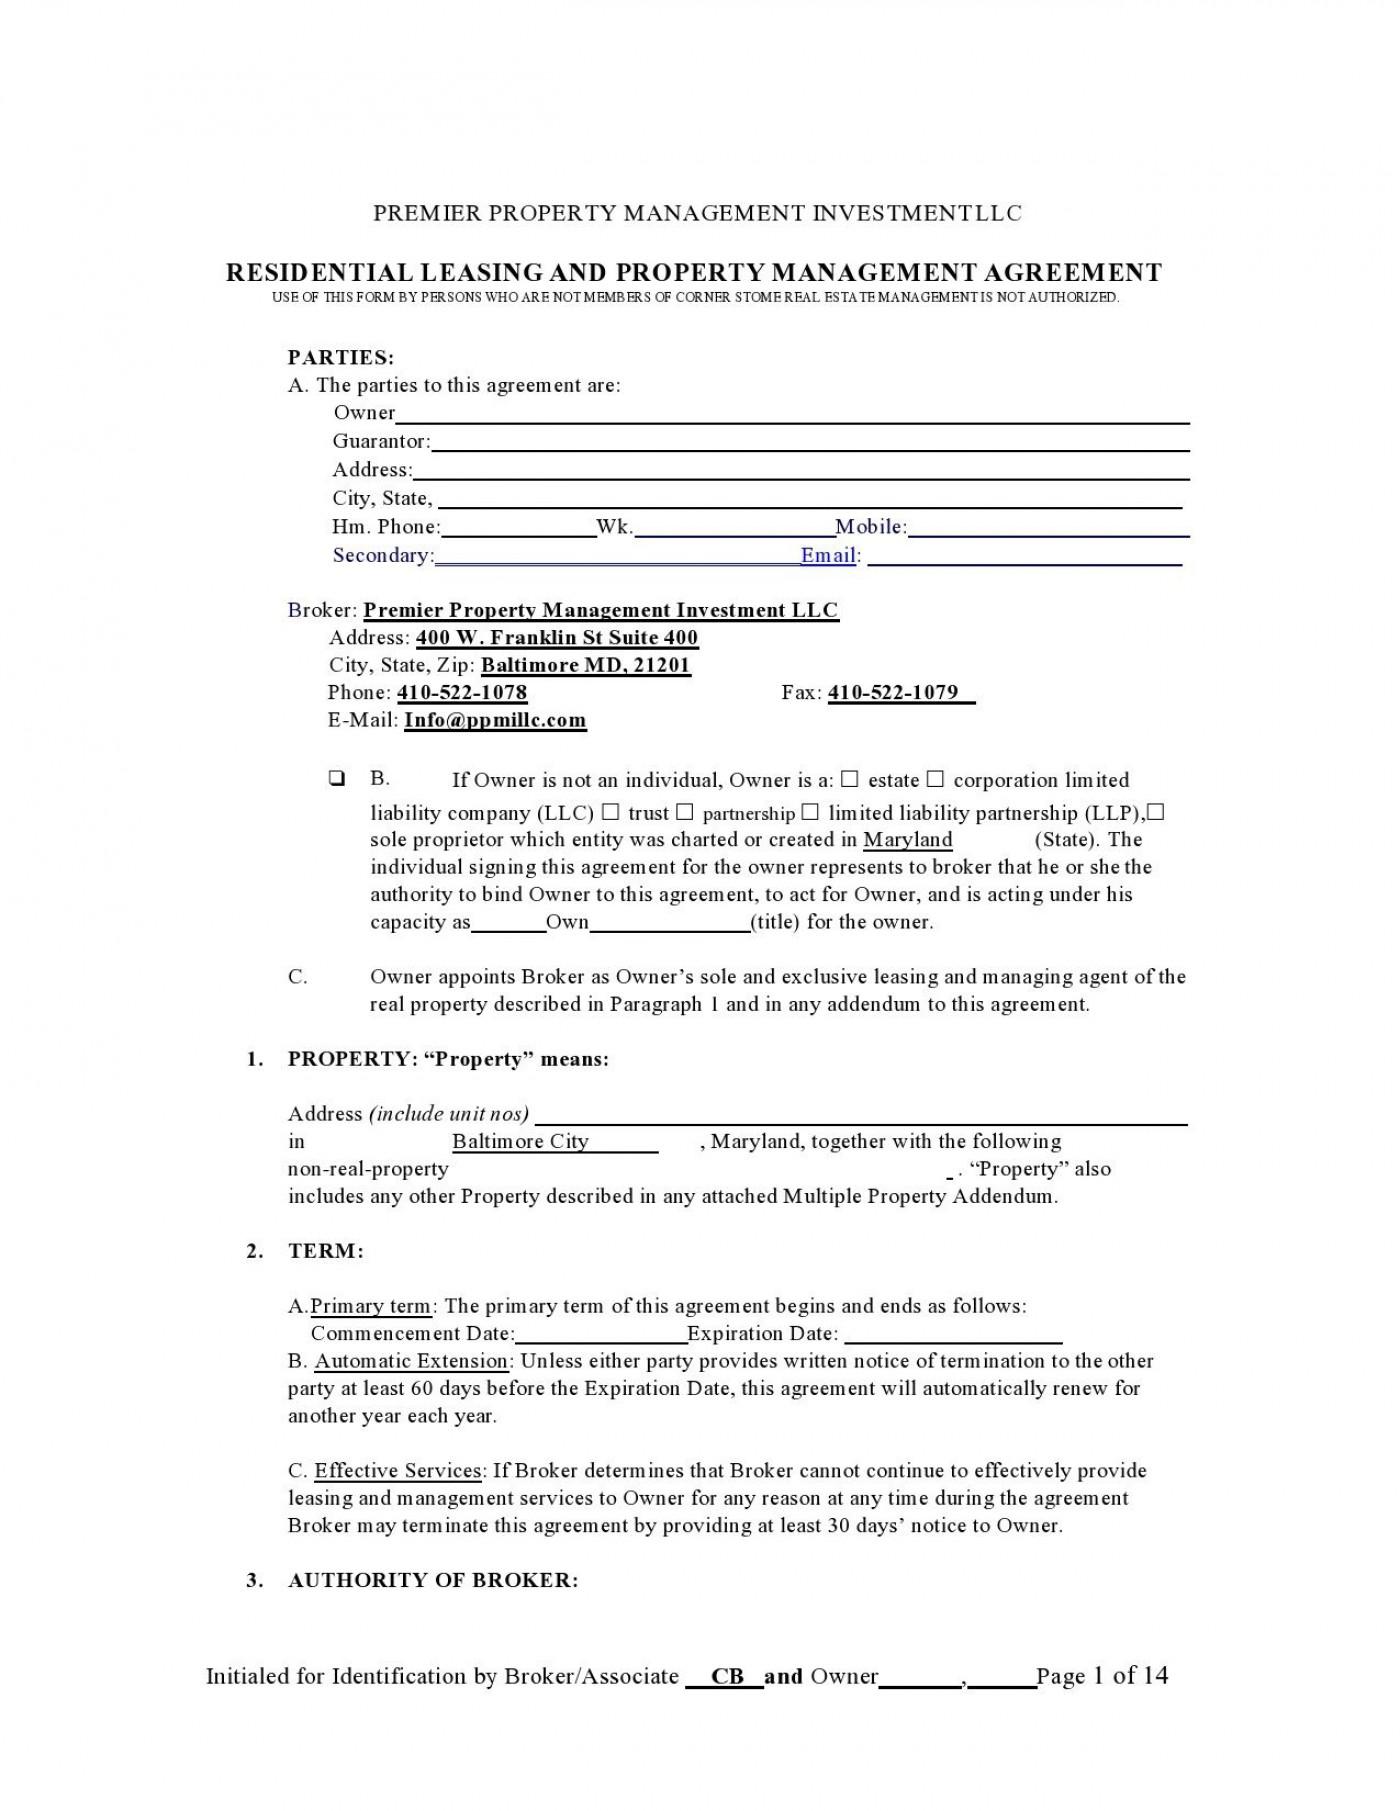 004 Impressive Commercial Property Management Agreement Template Uk Concept 1400